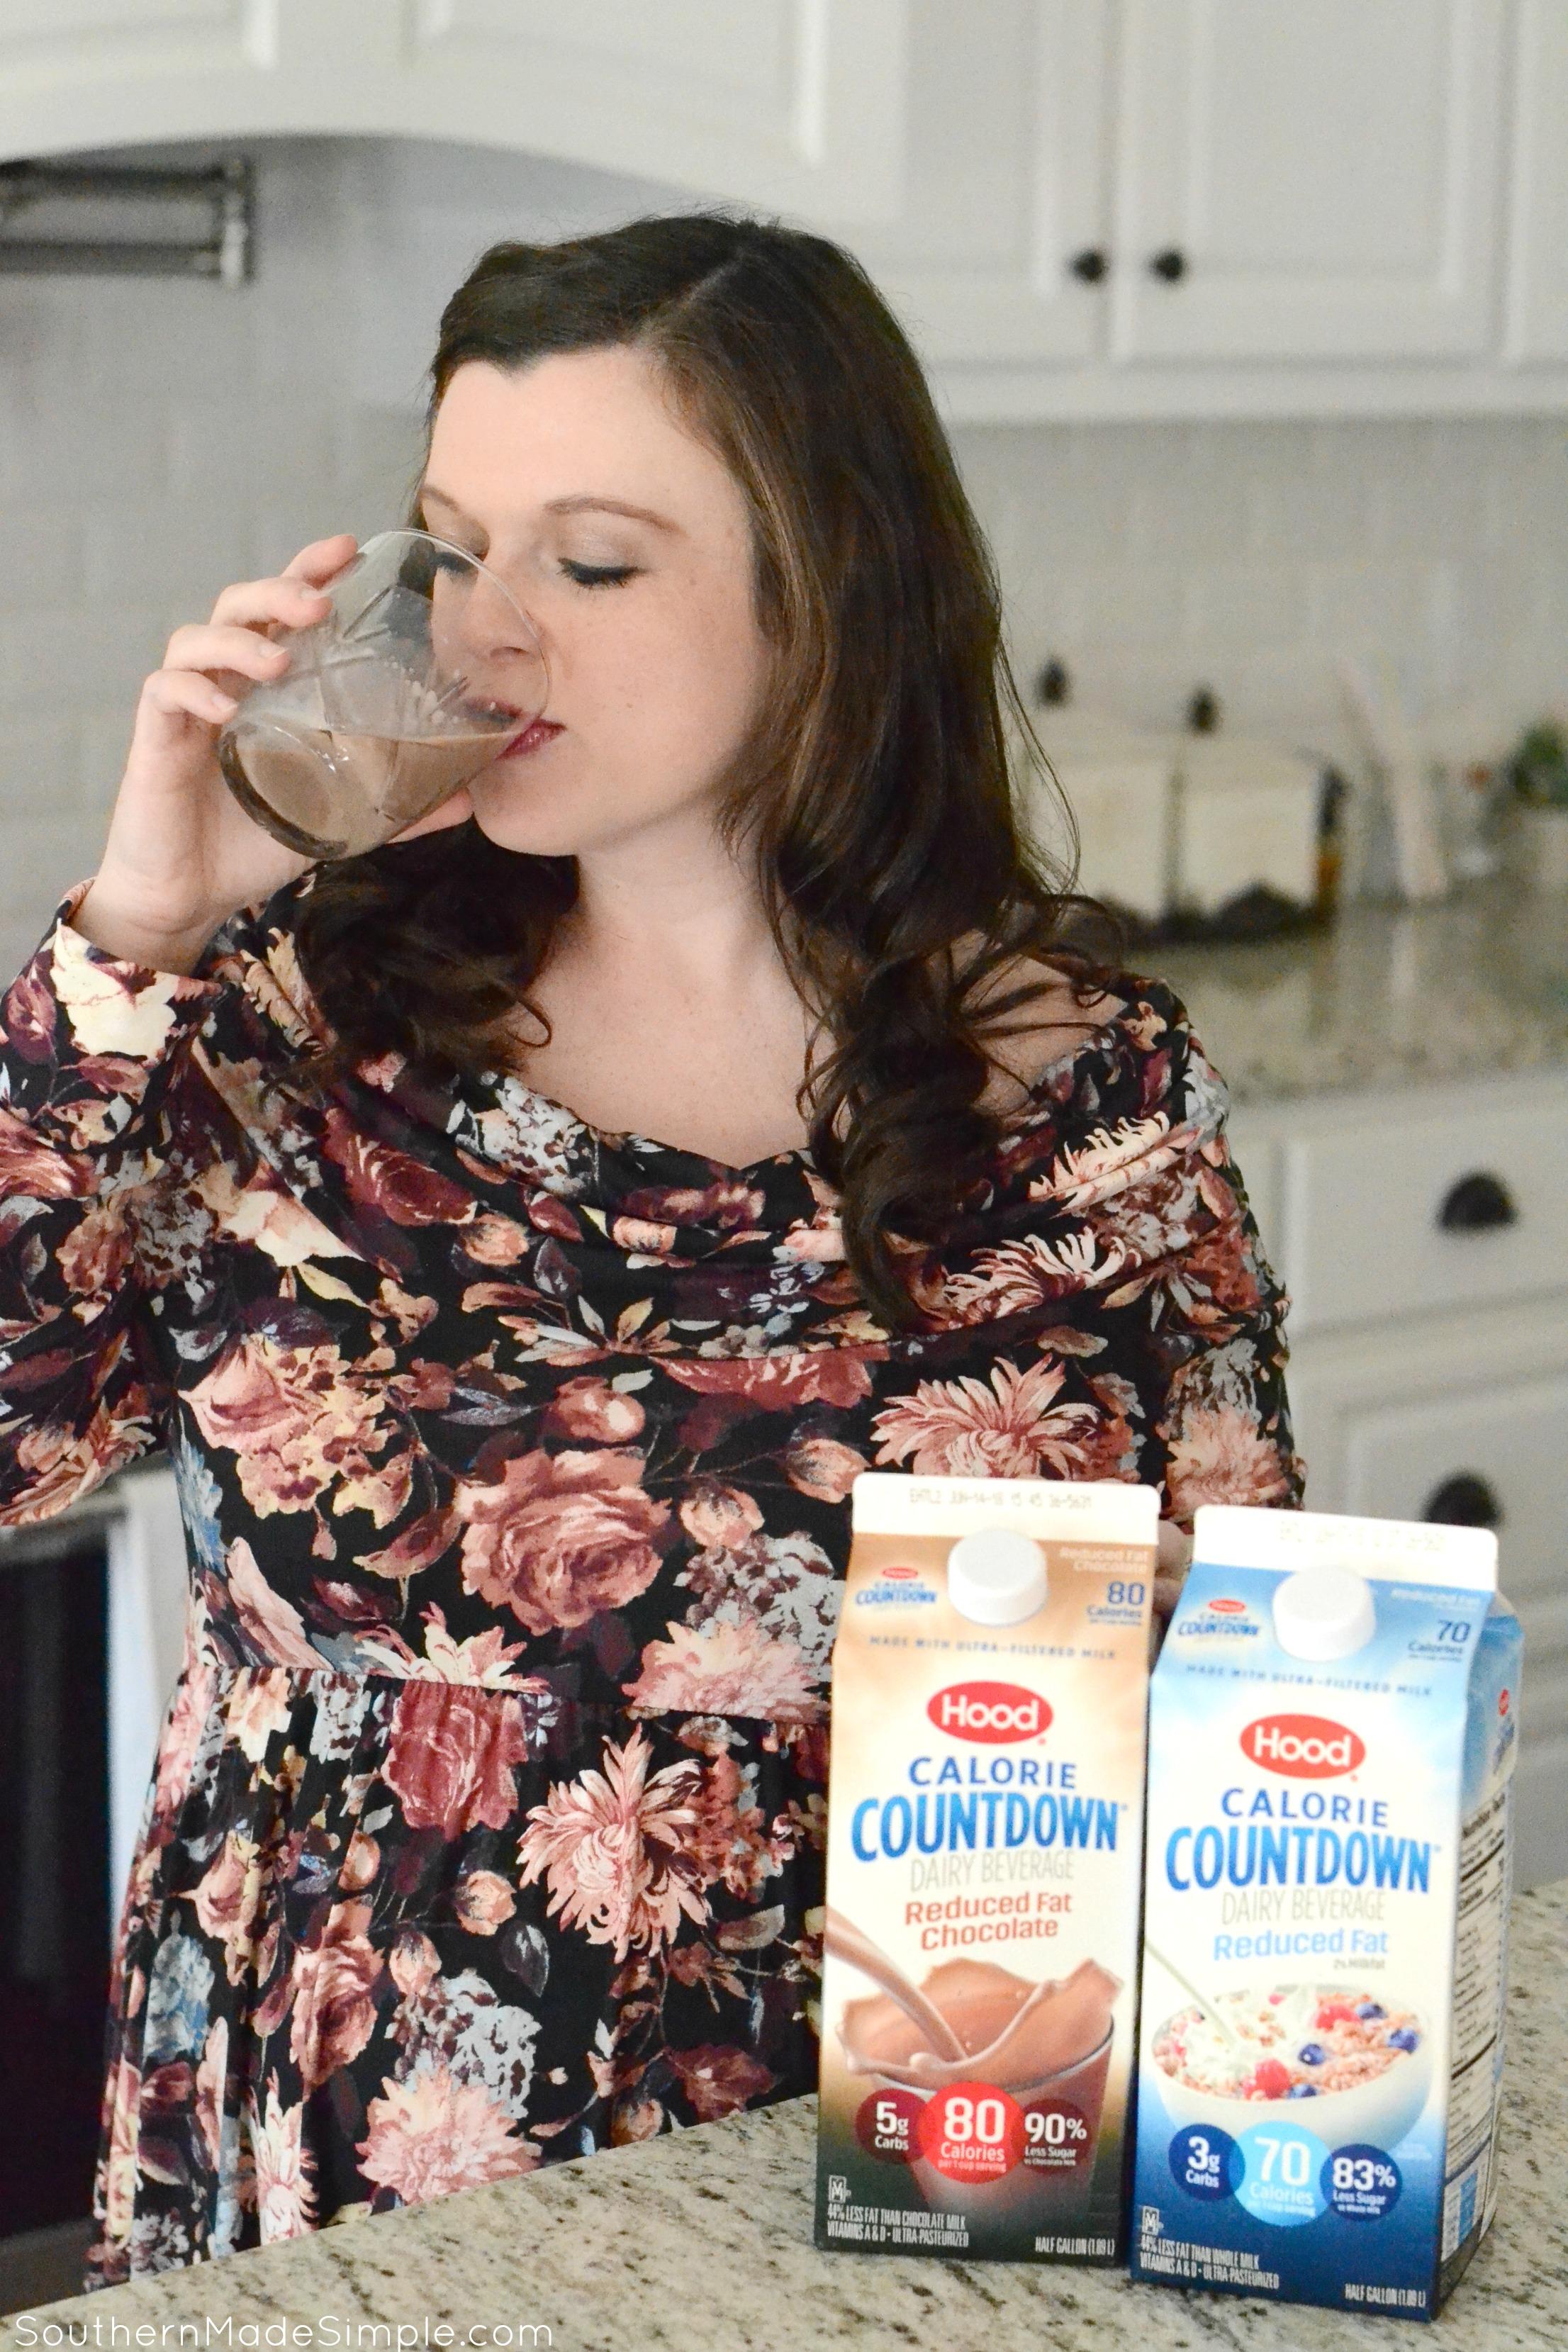 My Biggest Pregnancy Craving - & How I'm Enjoying it Guilt Free! #CalorieCountdown #IC #ad